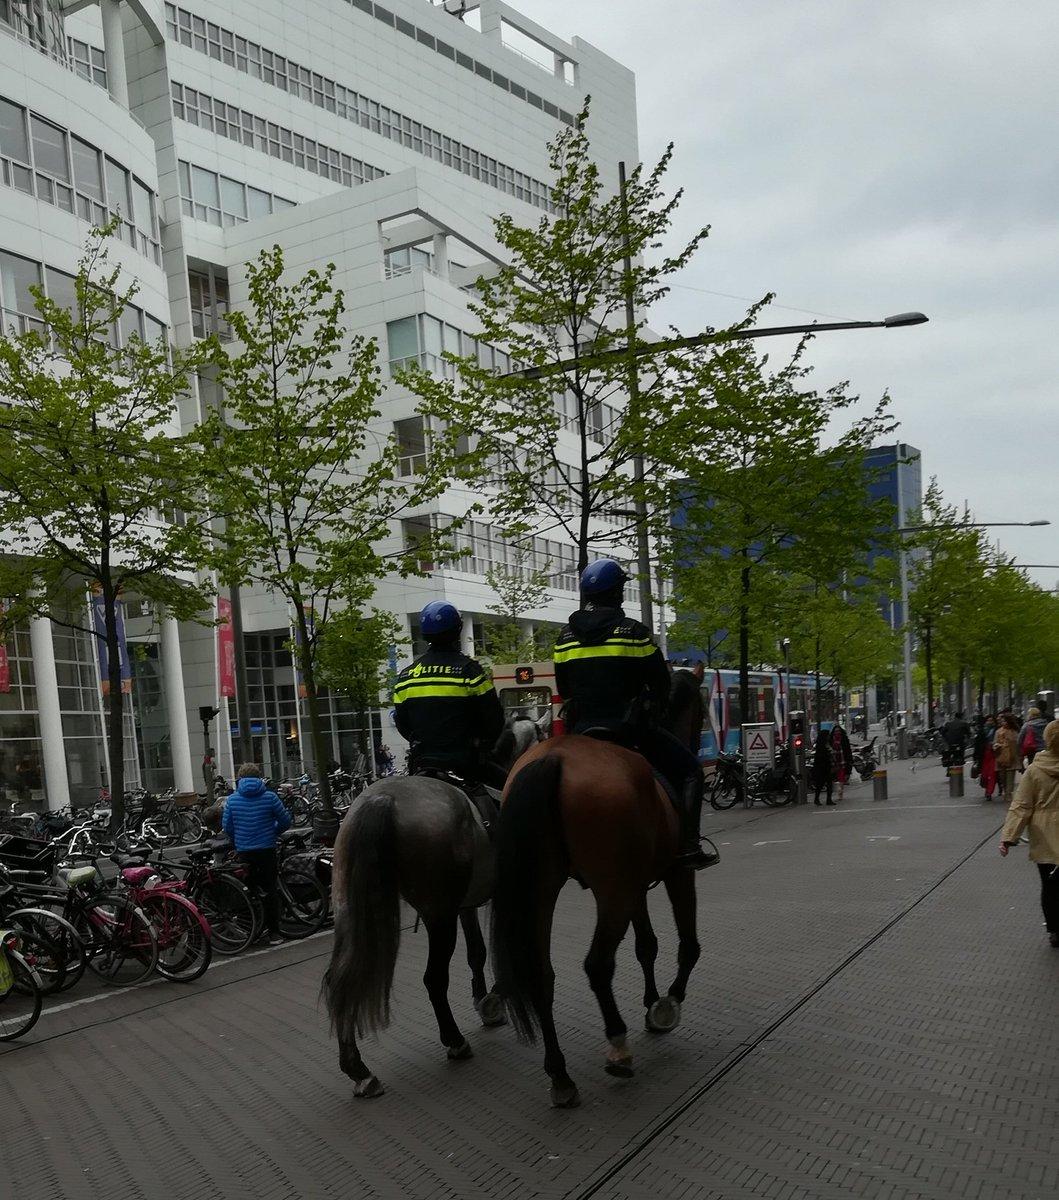 Police dogs https://t.co/yCcqTpXQ5P